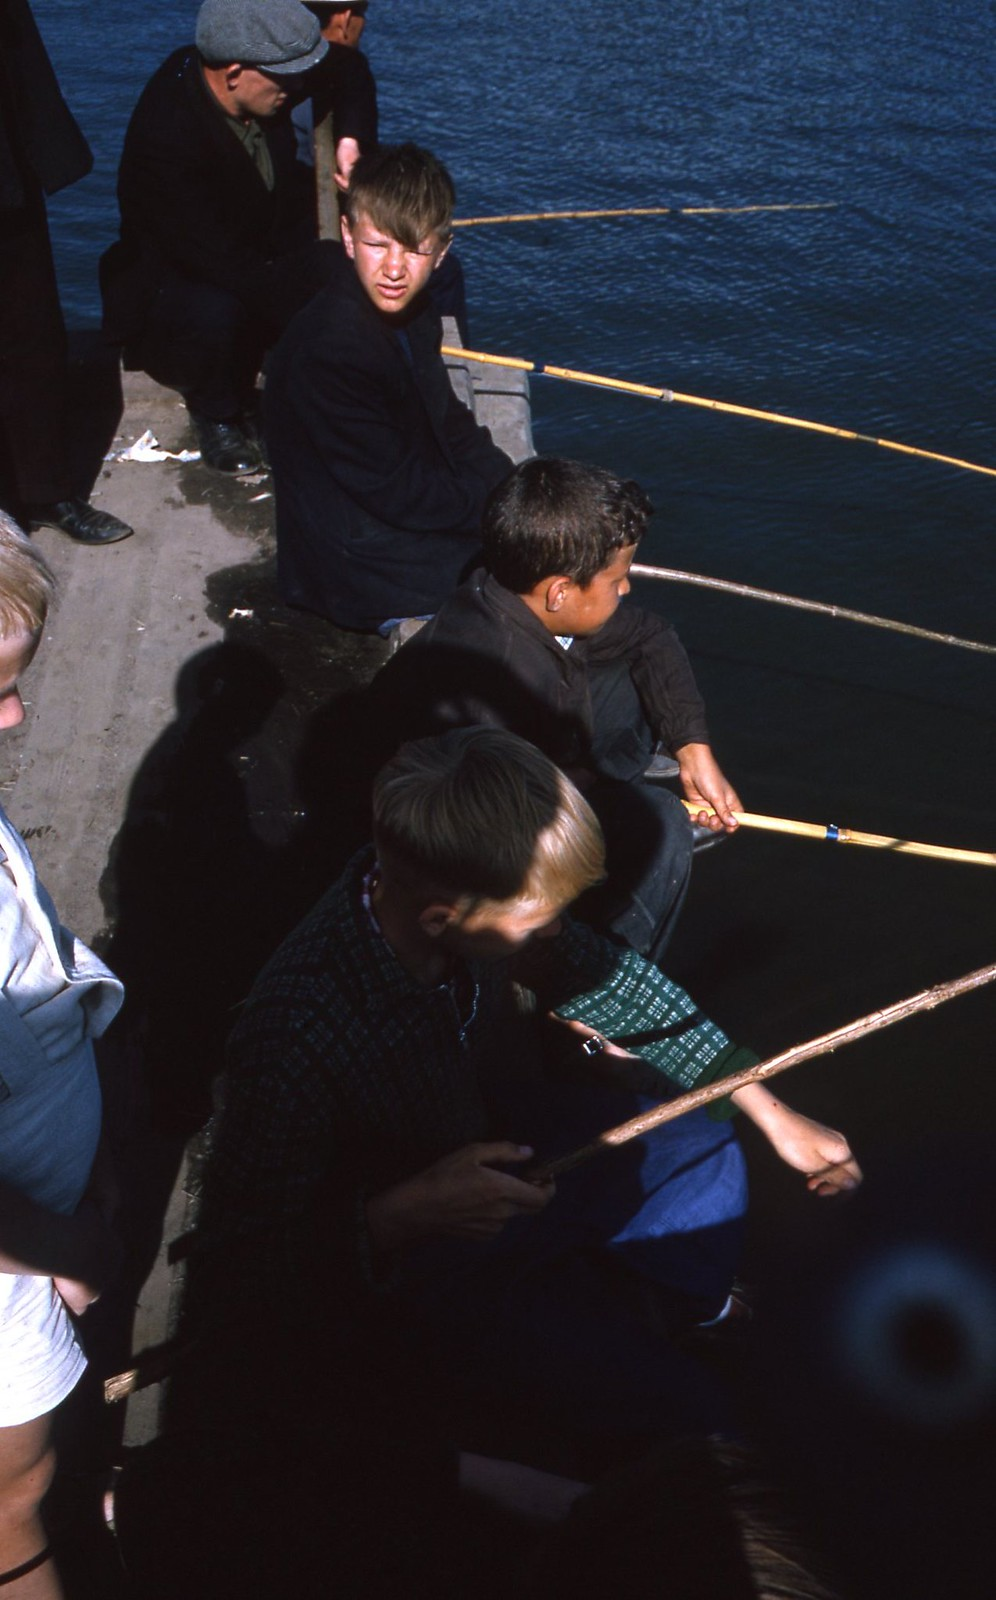 hammond-MA10-Ostankino-people-sunbathing-and-fishing-010